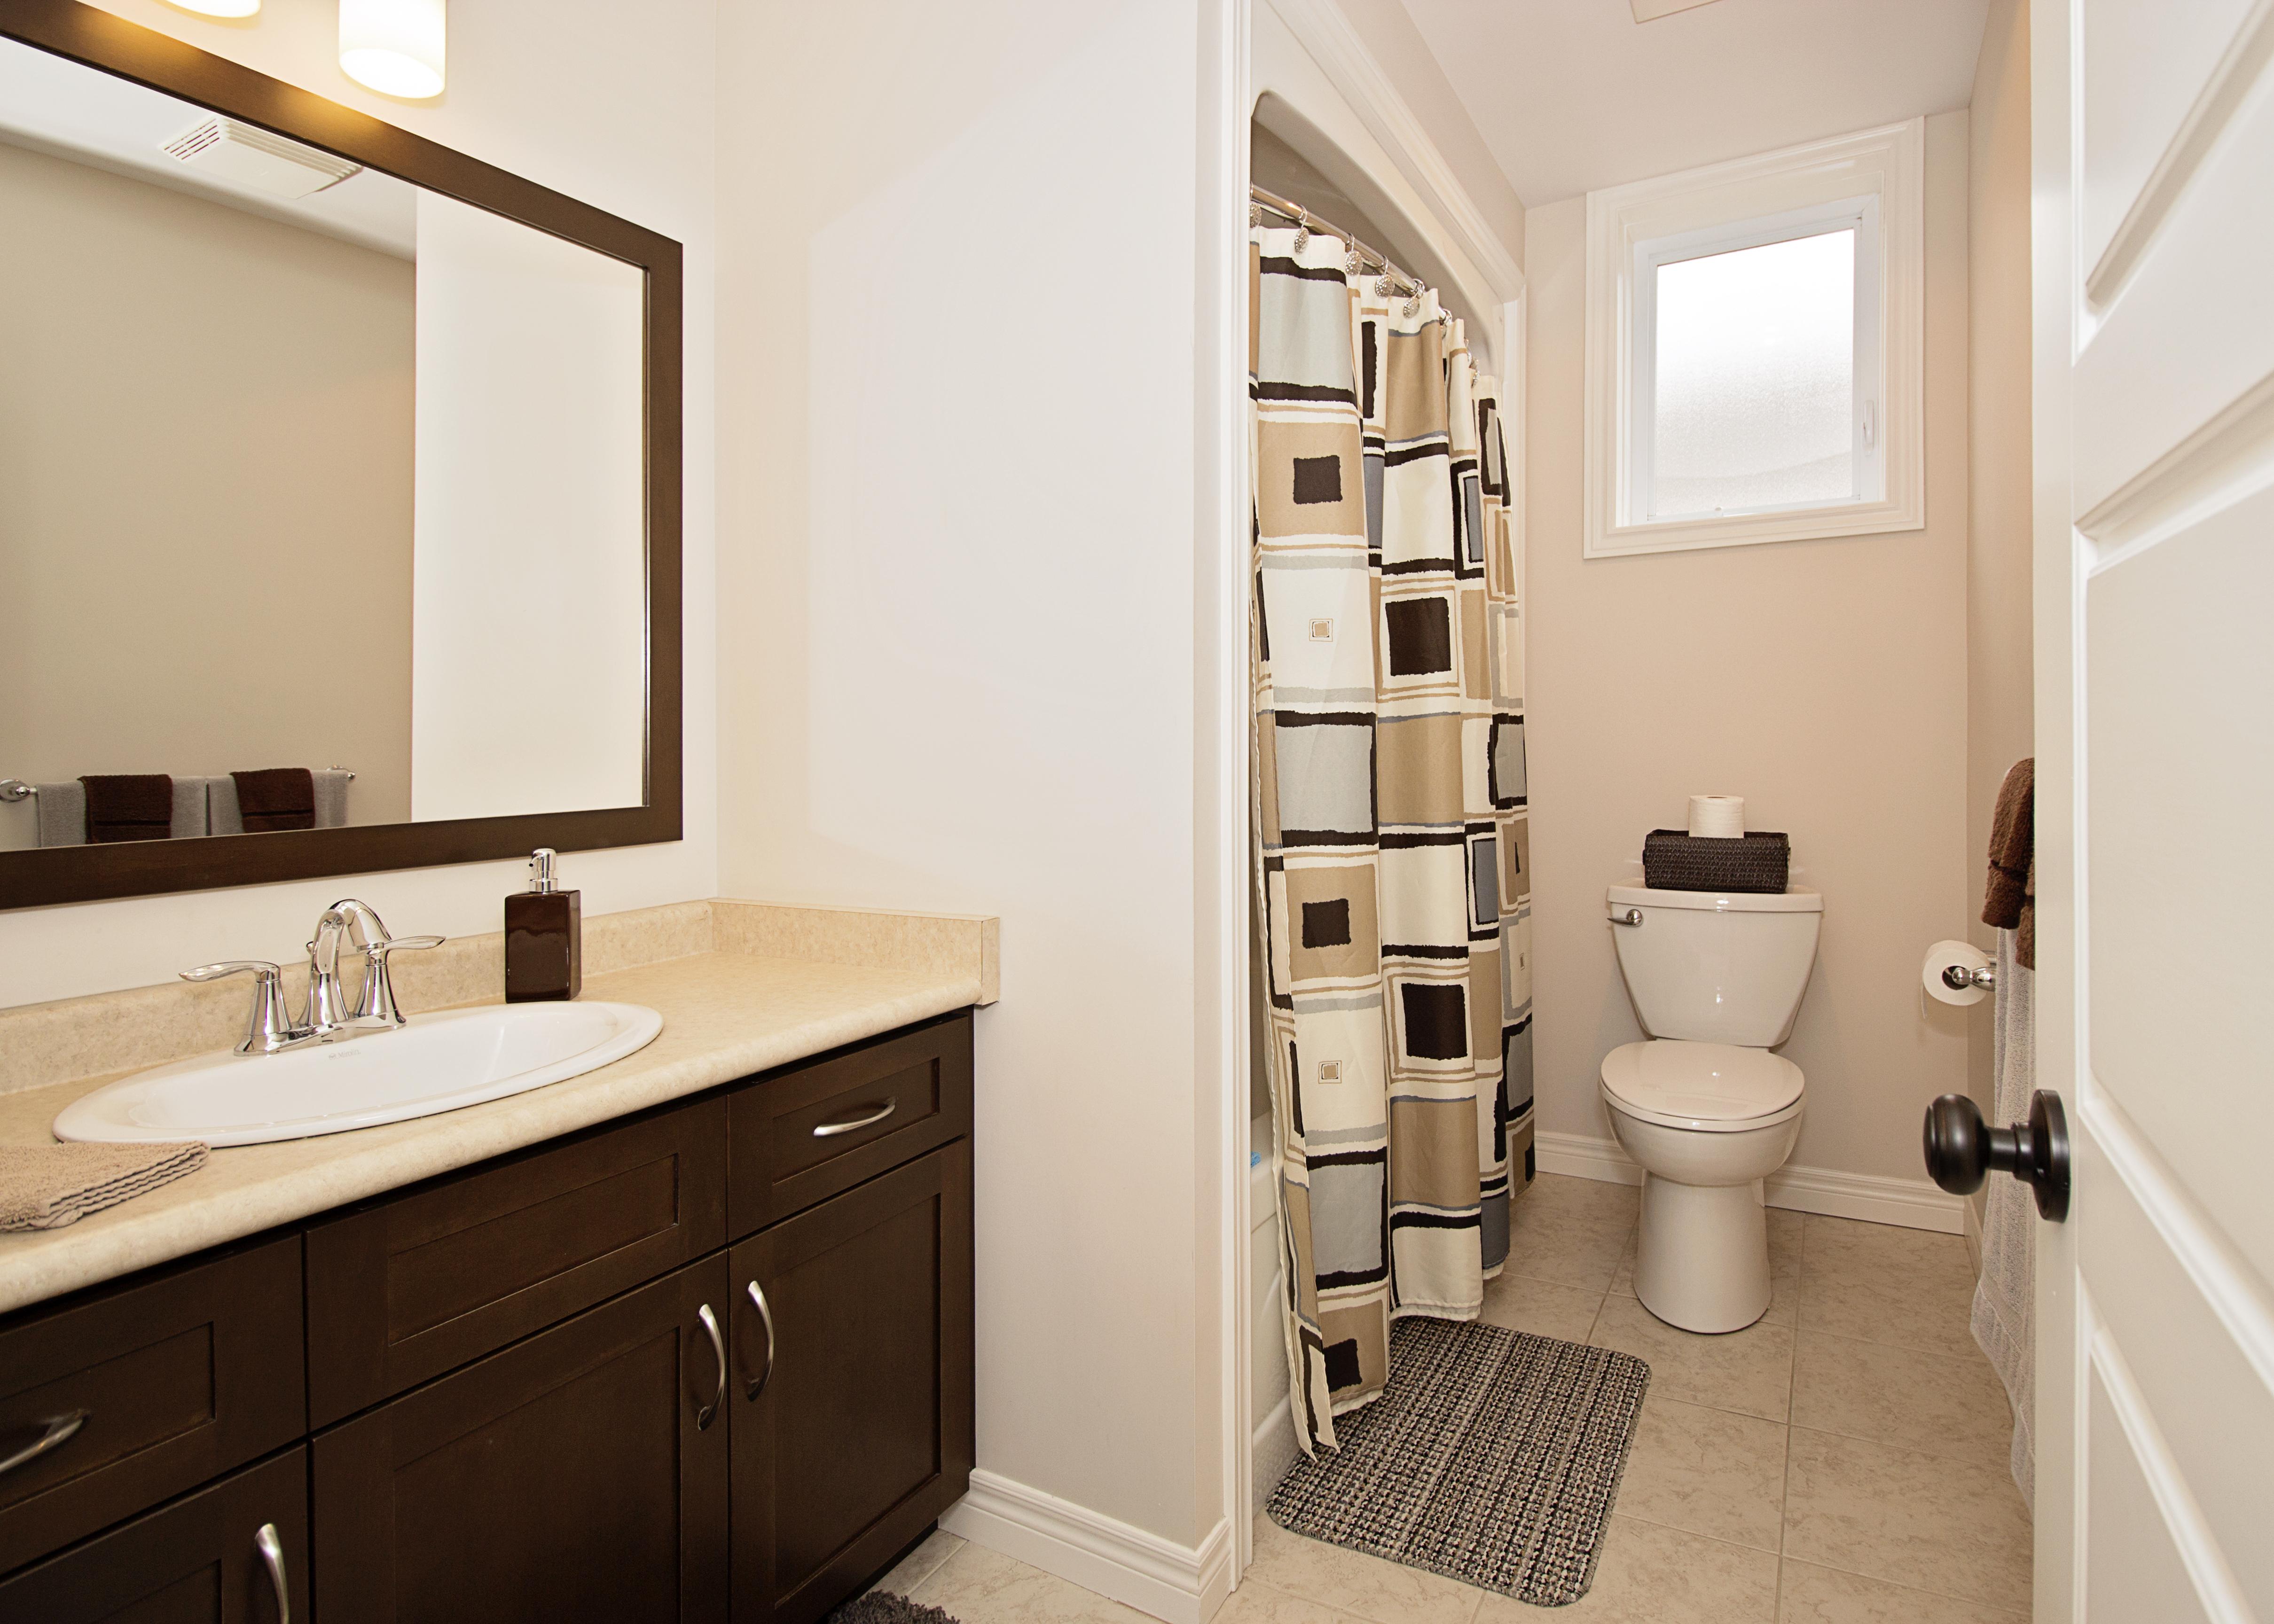 4pc. Bathroom